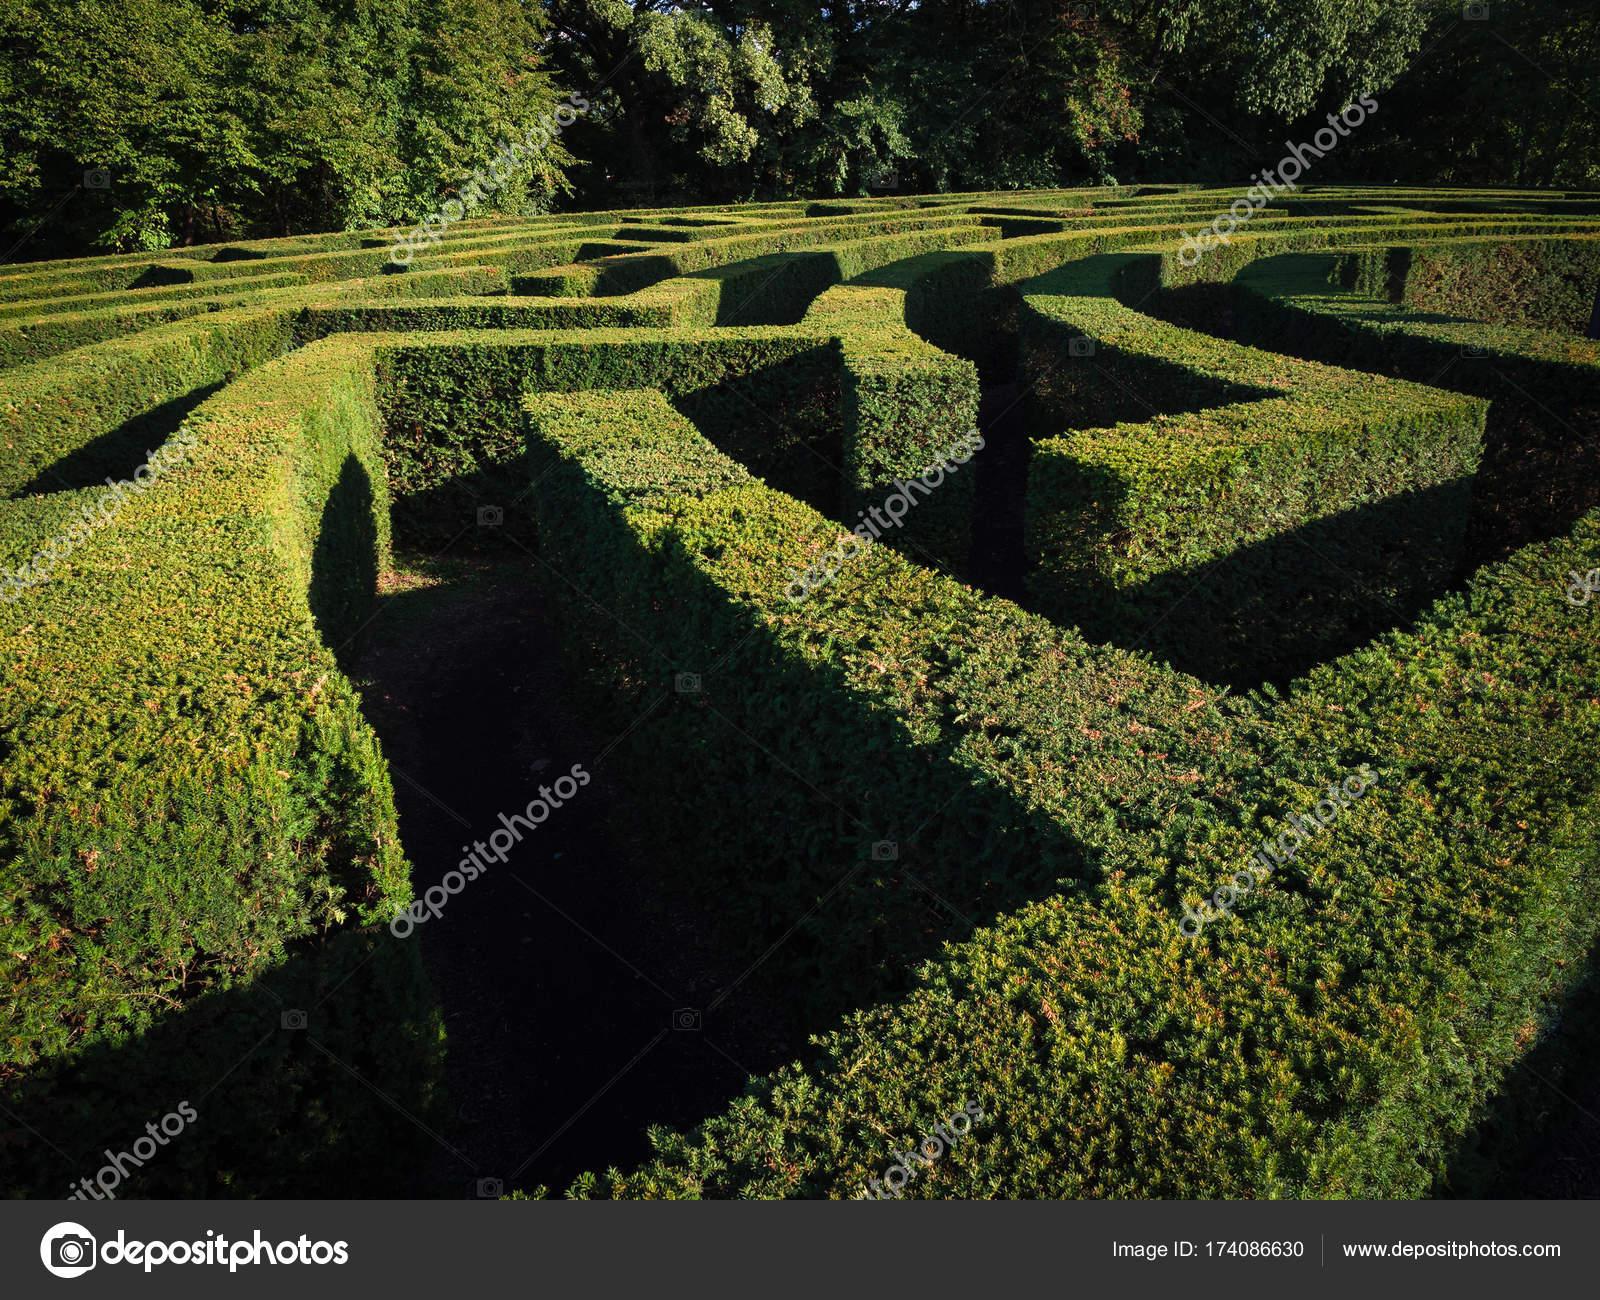 Green bushes labyrinth, landscape gardening design — Stock Photo on spiral labyrinth garden, labyrinth herb garden, labyrinth garden kit, lavender labyrinth garden, labyrinth flower garden, labyrinth meditation garden, labyrinth garden designs, spiritual labyrinth garden,